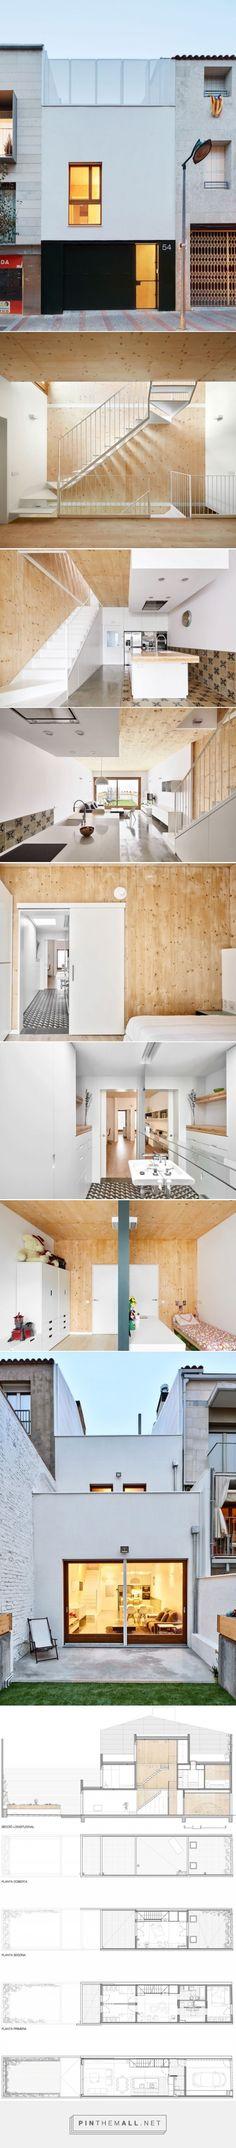 Vallribera Arquitectes > Casa entre mitgeres al Centre de Terrassa | HIC Arquitectura http://hicarquitectura.com/2016/01/vallribera-arquitectes-casa-entre-mitgeres-al-centre-de-terrassa/ - created on 2016-07-04 09:41:07